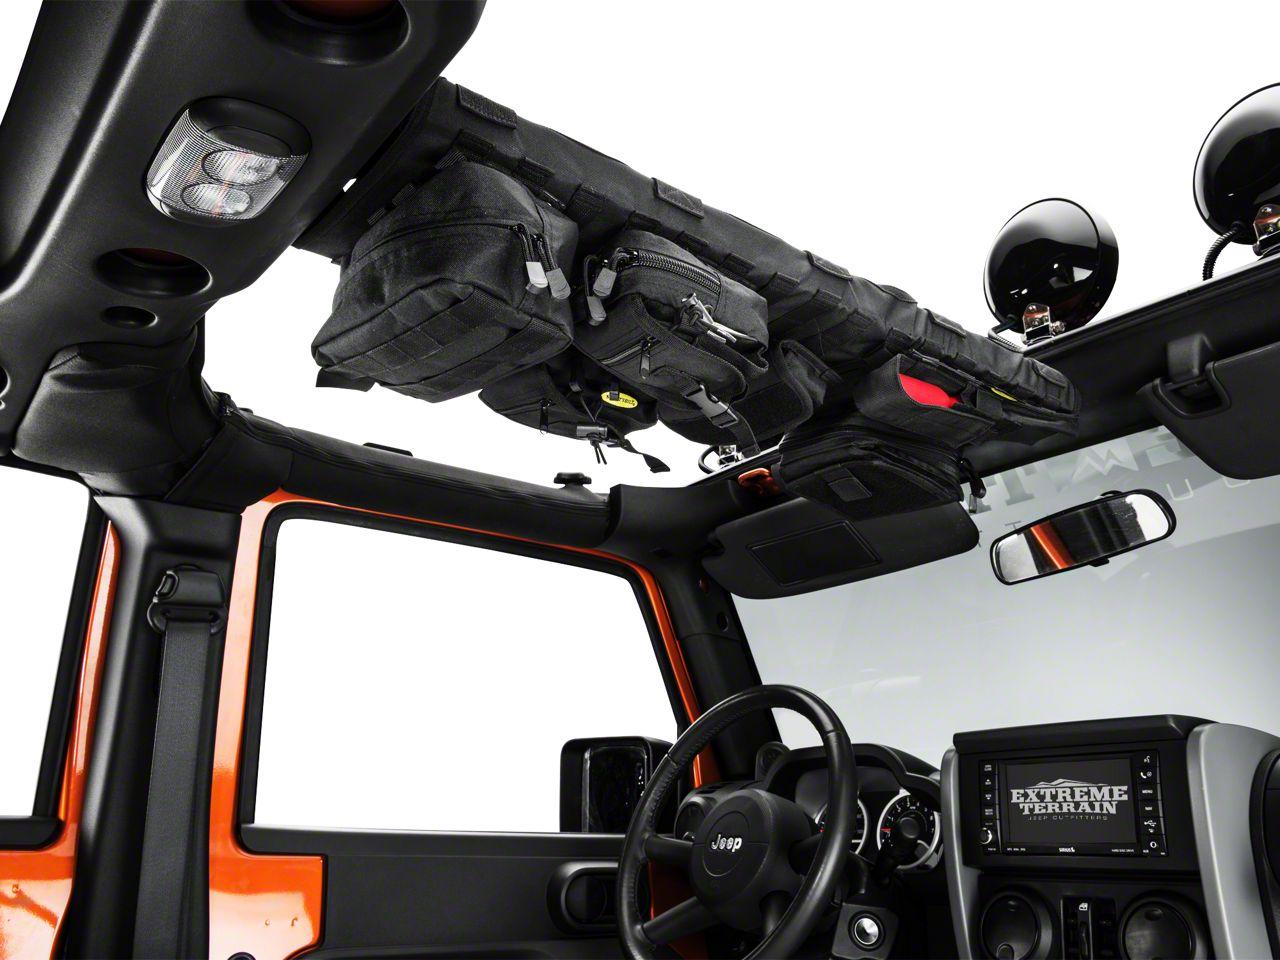 Smittybilt GEAR Overhead Console - Black (07-18 Jeep Wrangler JK)